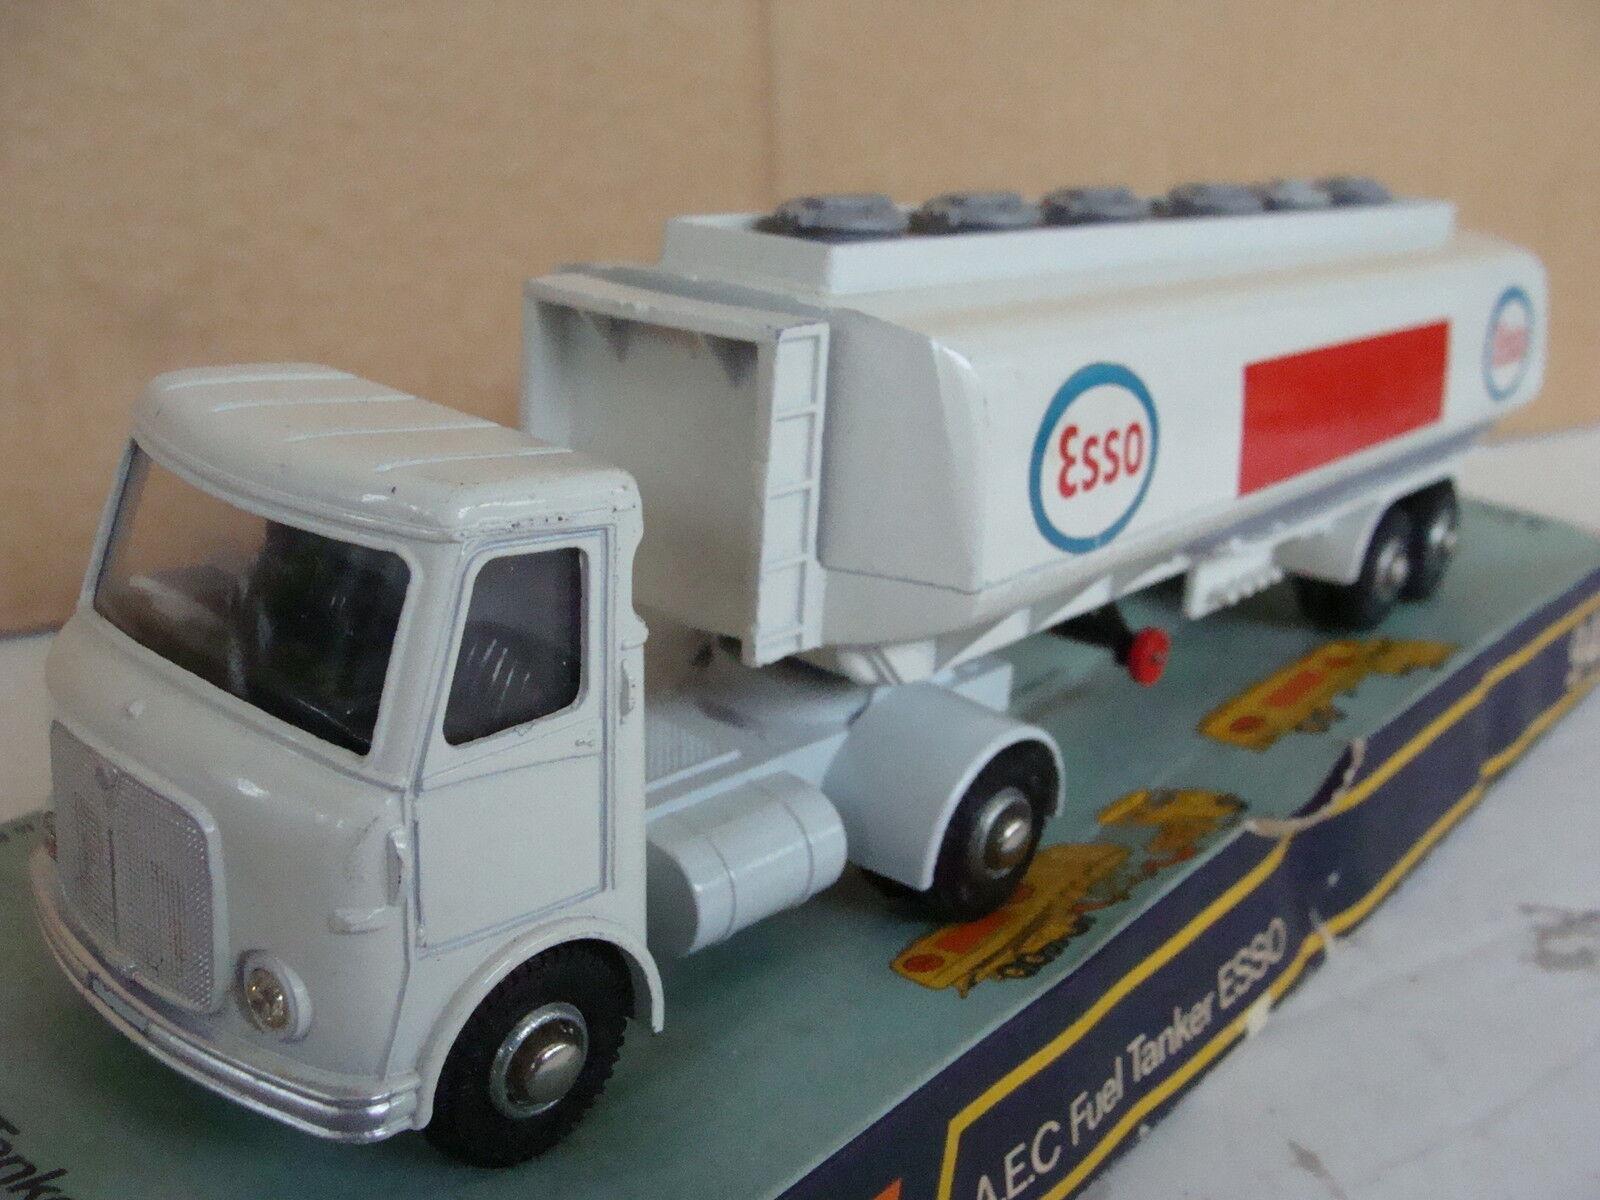 Truck Truck Dinky fuel tanker it 945 box old toys